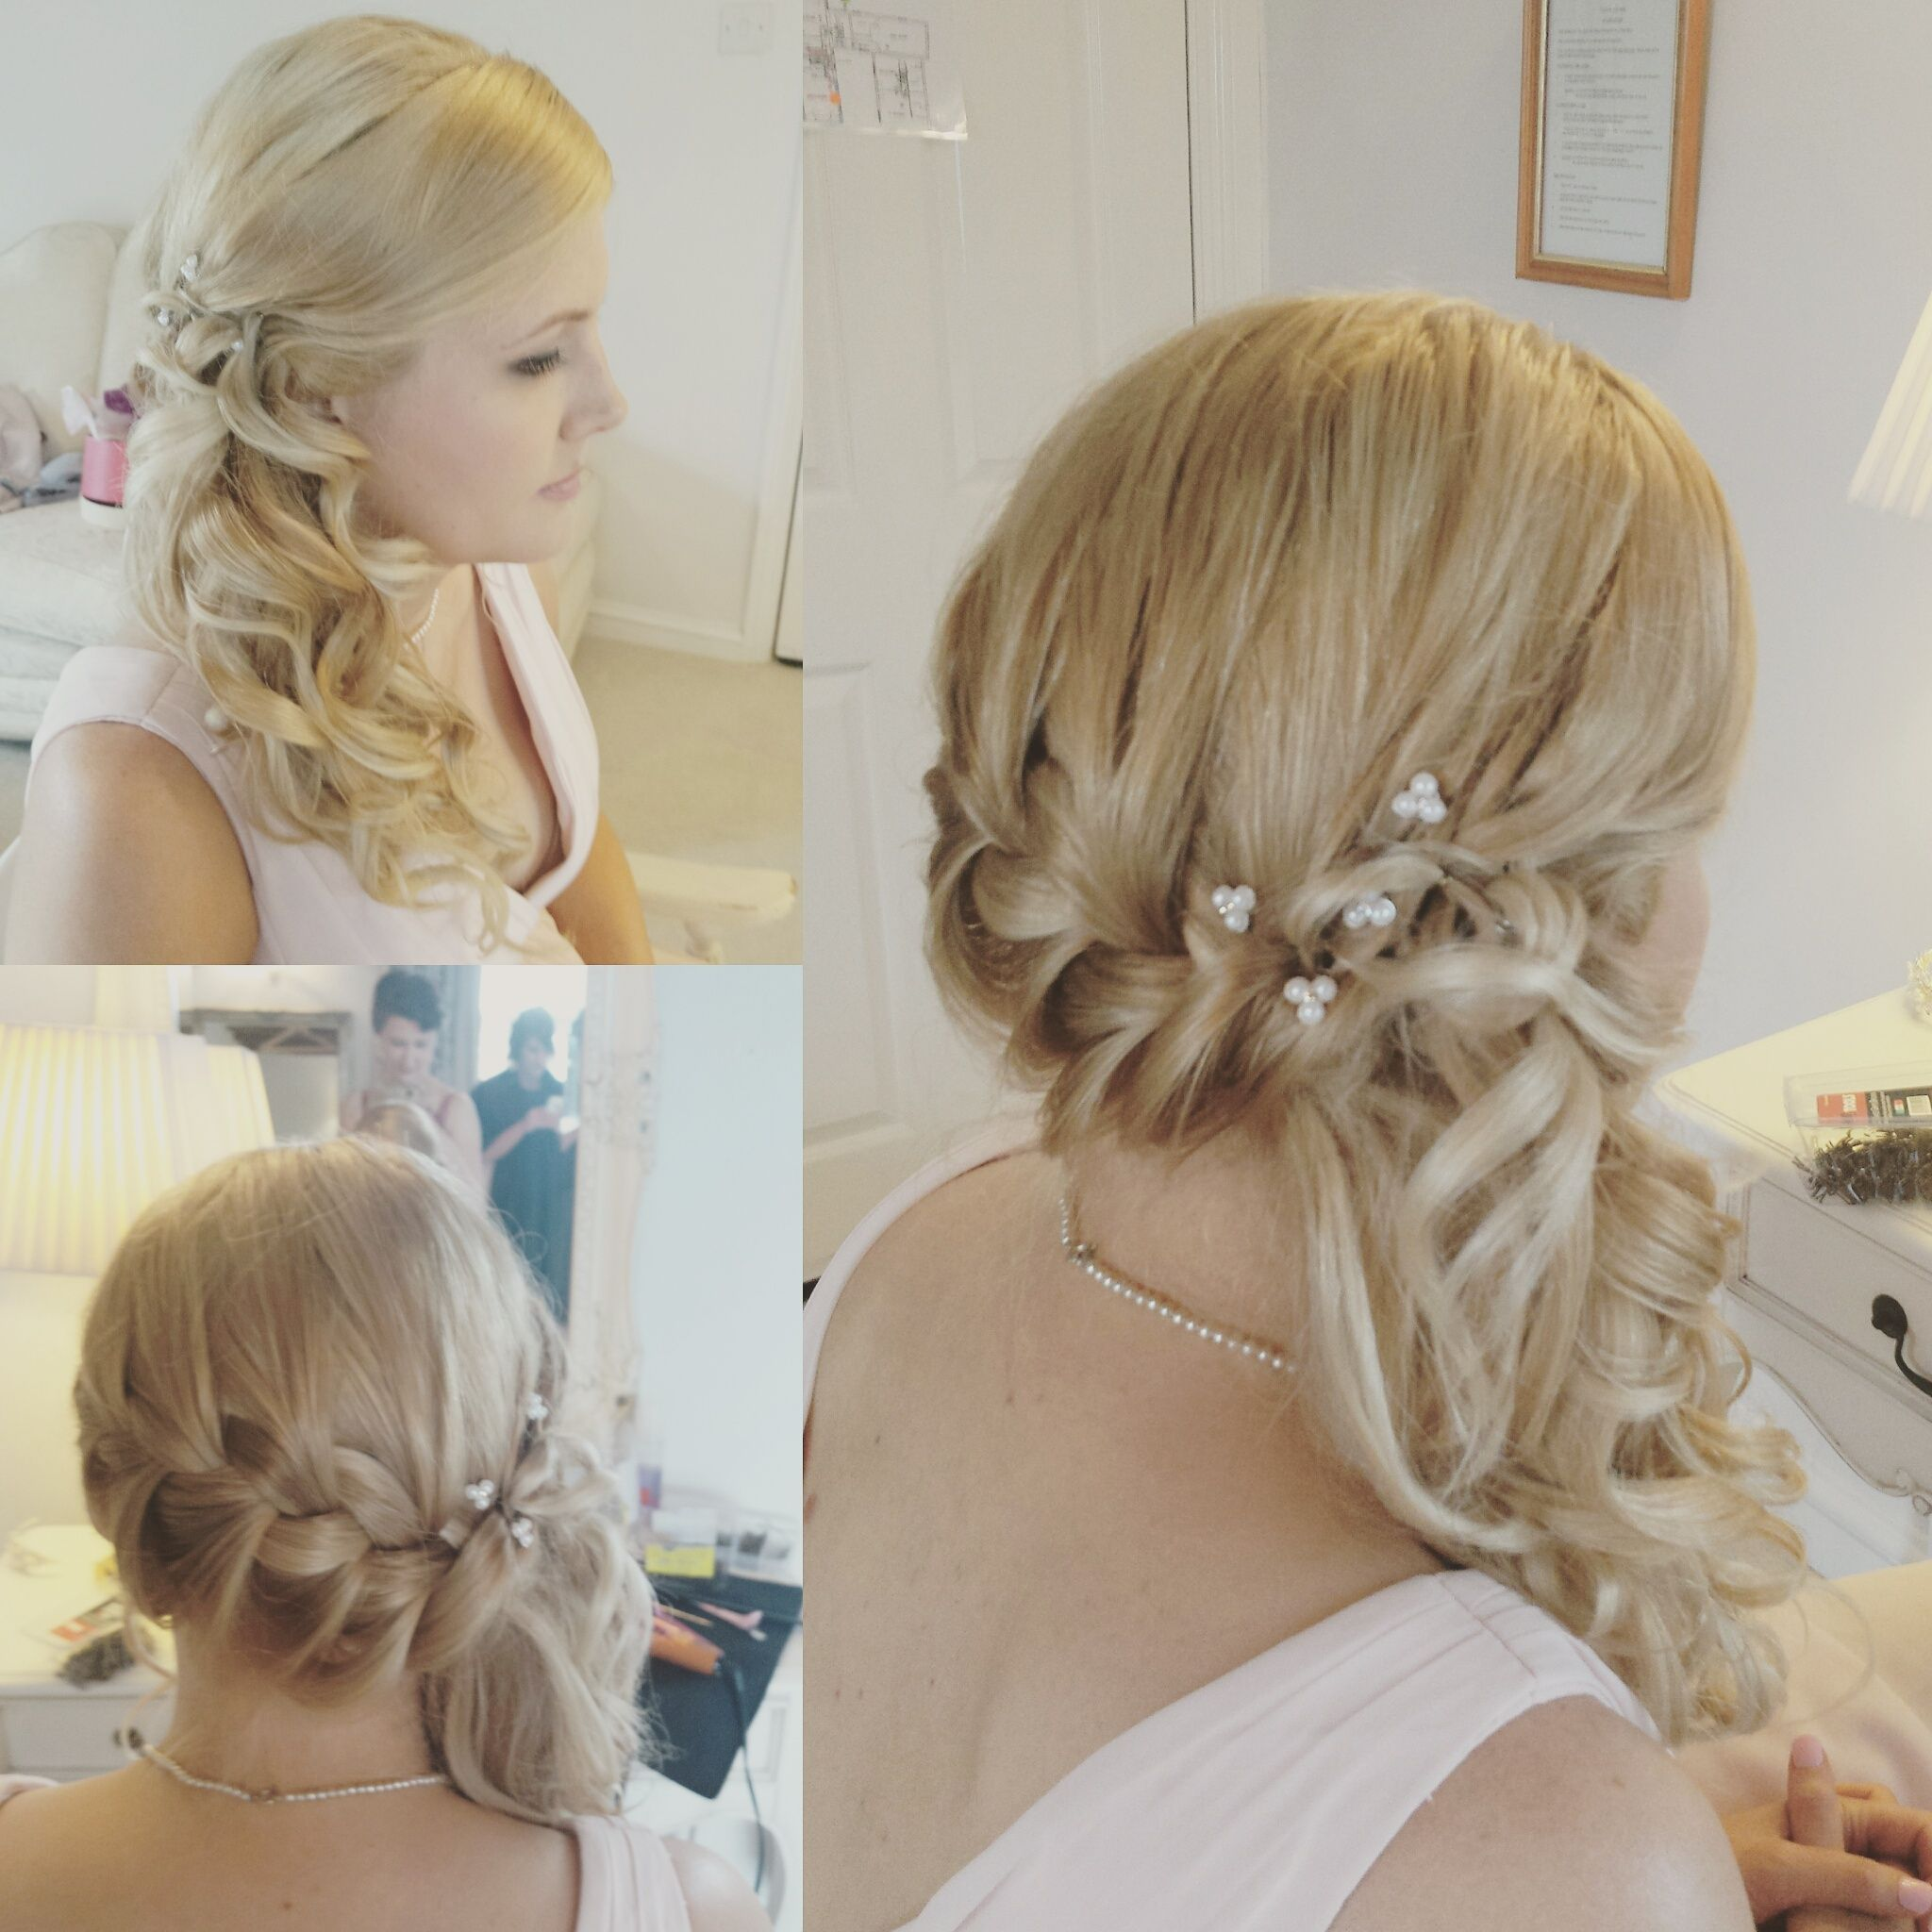 Plaits And Curls Bridal Hair Look Norwich Norfolk Hairdresser Plaits Hairstyles Bridemaids Hairstyles Wedding Hair Plaits